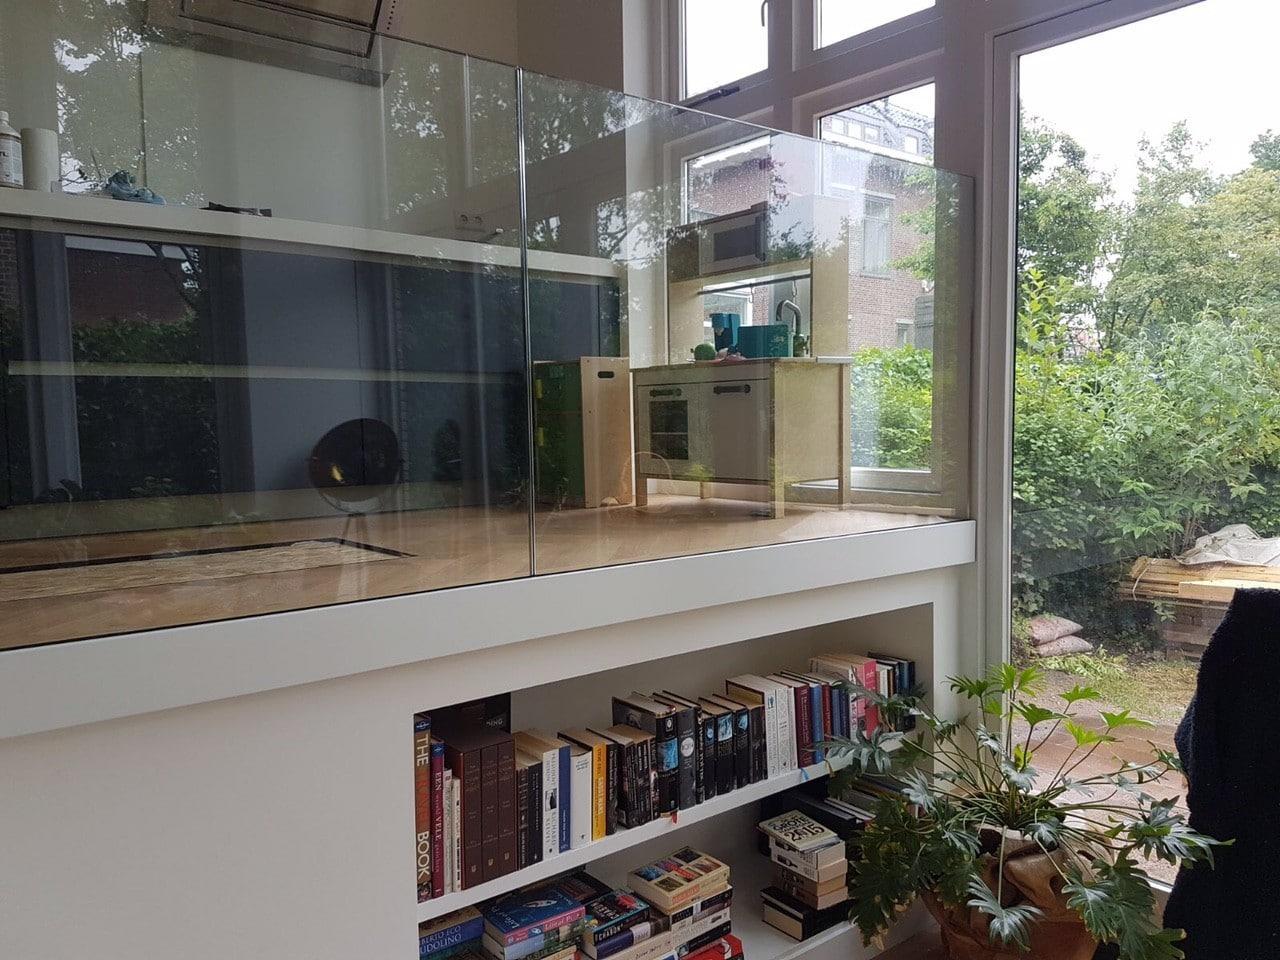 Glazen balustrade in wit vloeprofiel